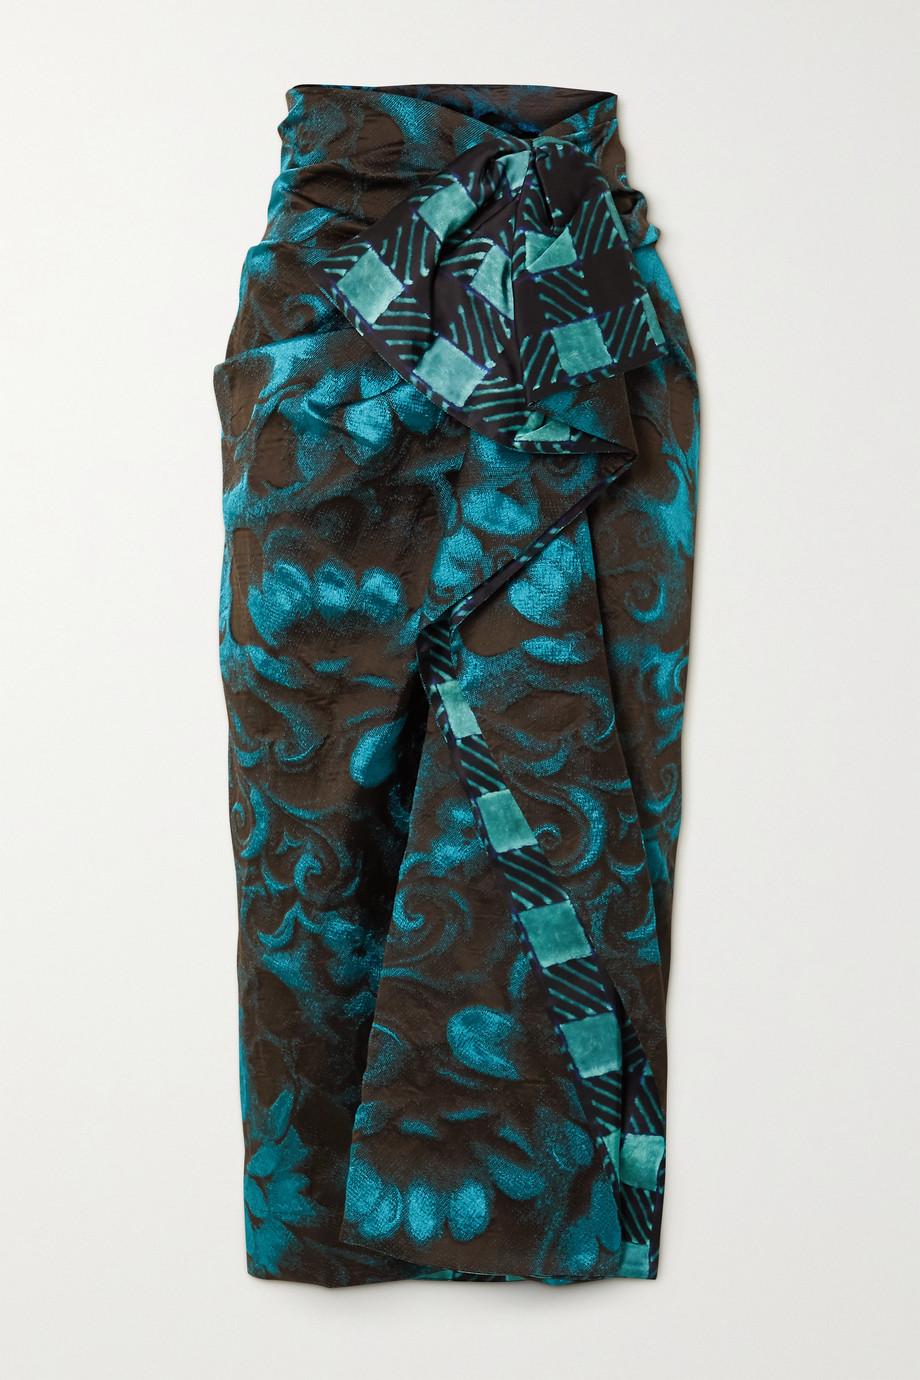 Dries Van Noten Ruffled satin-trimmed floral-jacquard midi skirt